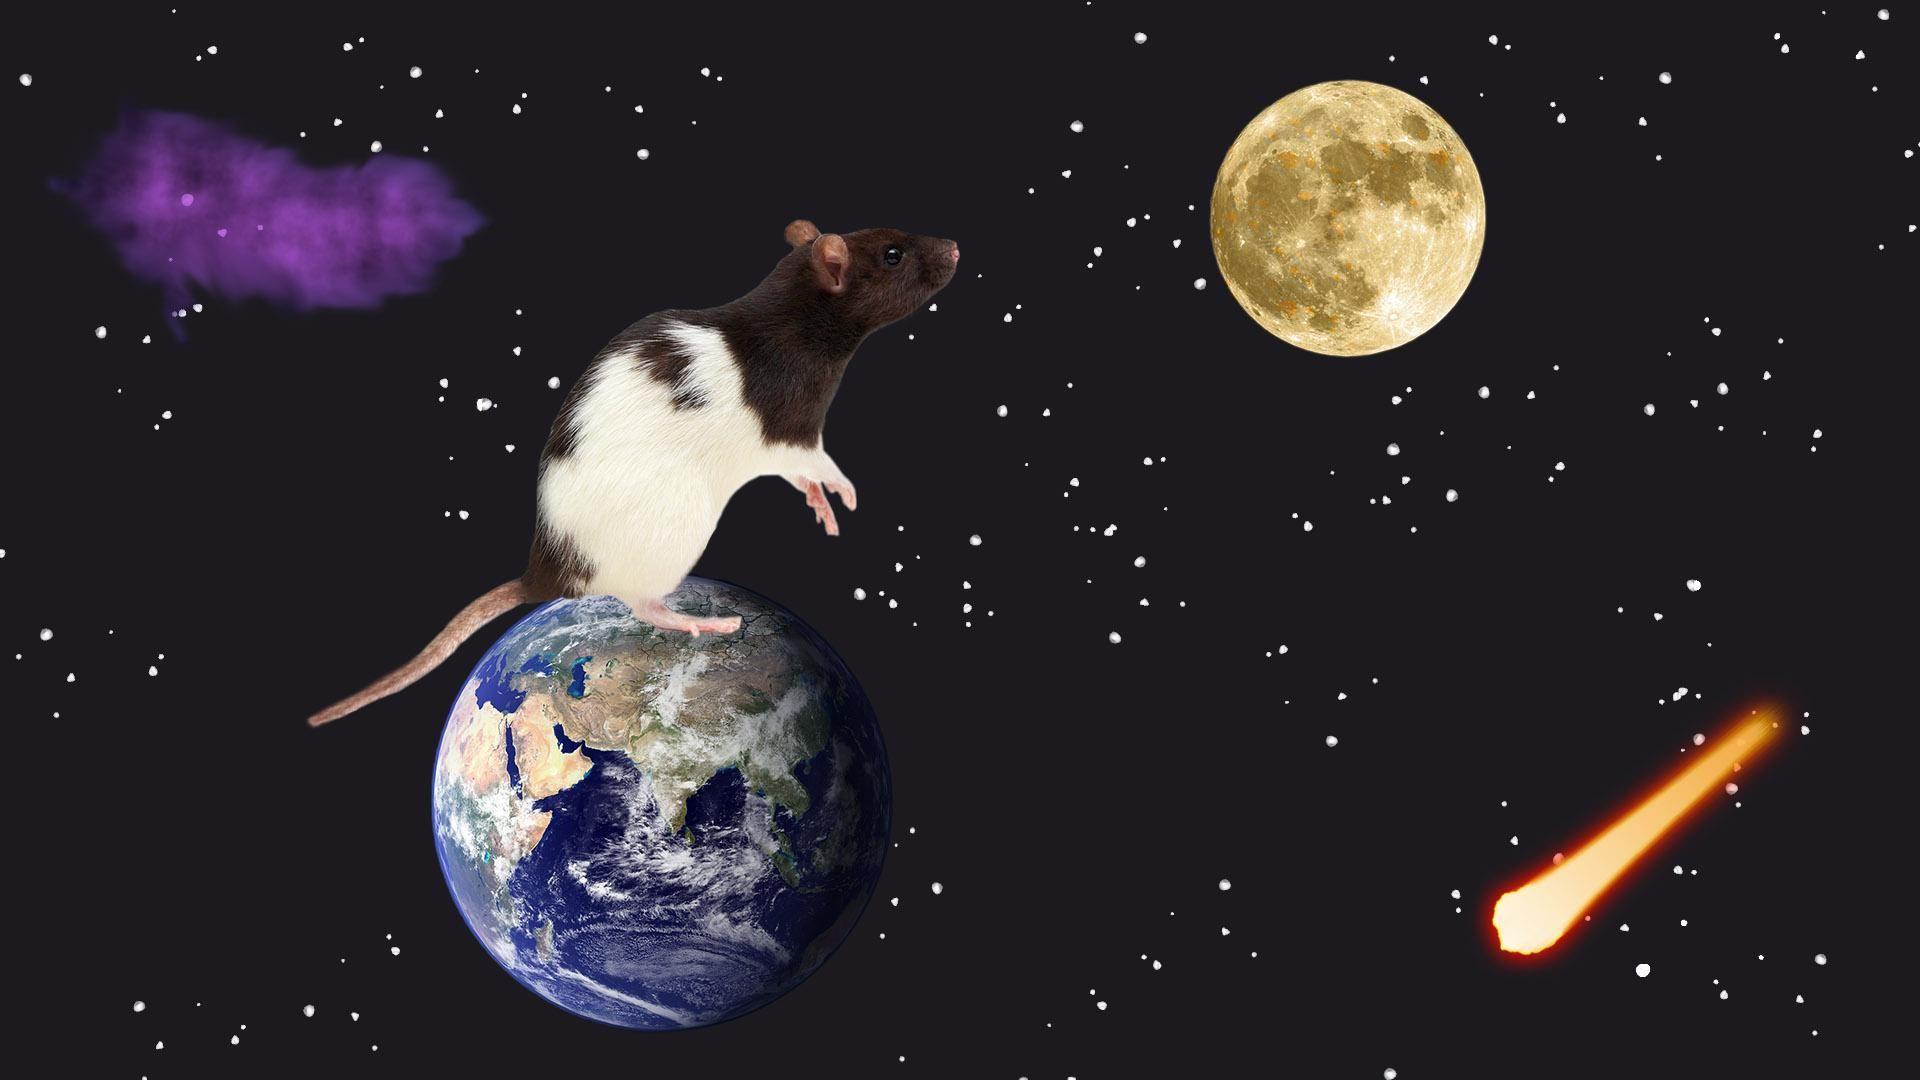 1920x1080 Rat Looking At Some Cheese Wallpaper Wallpaper Rats